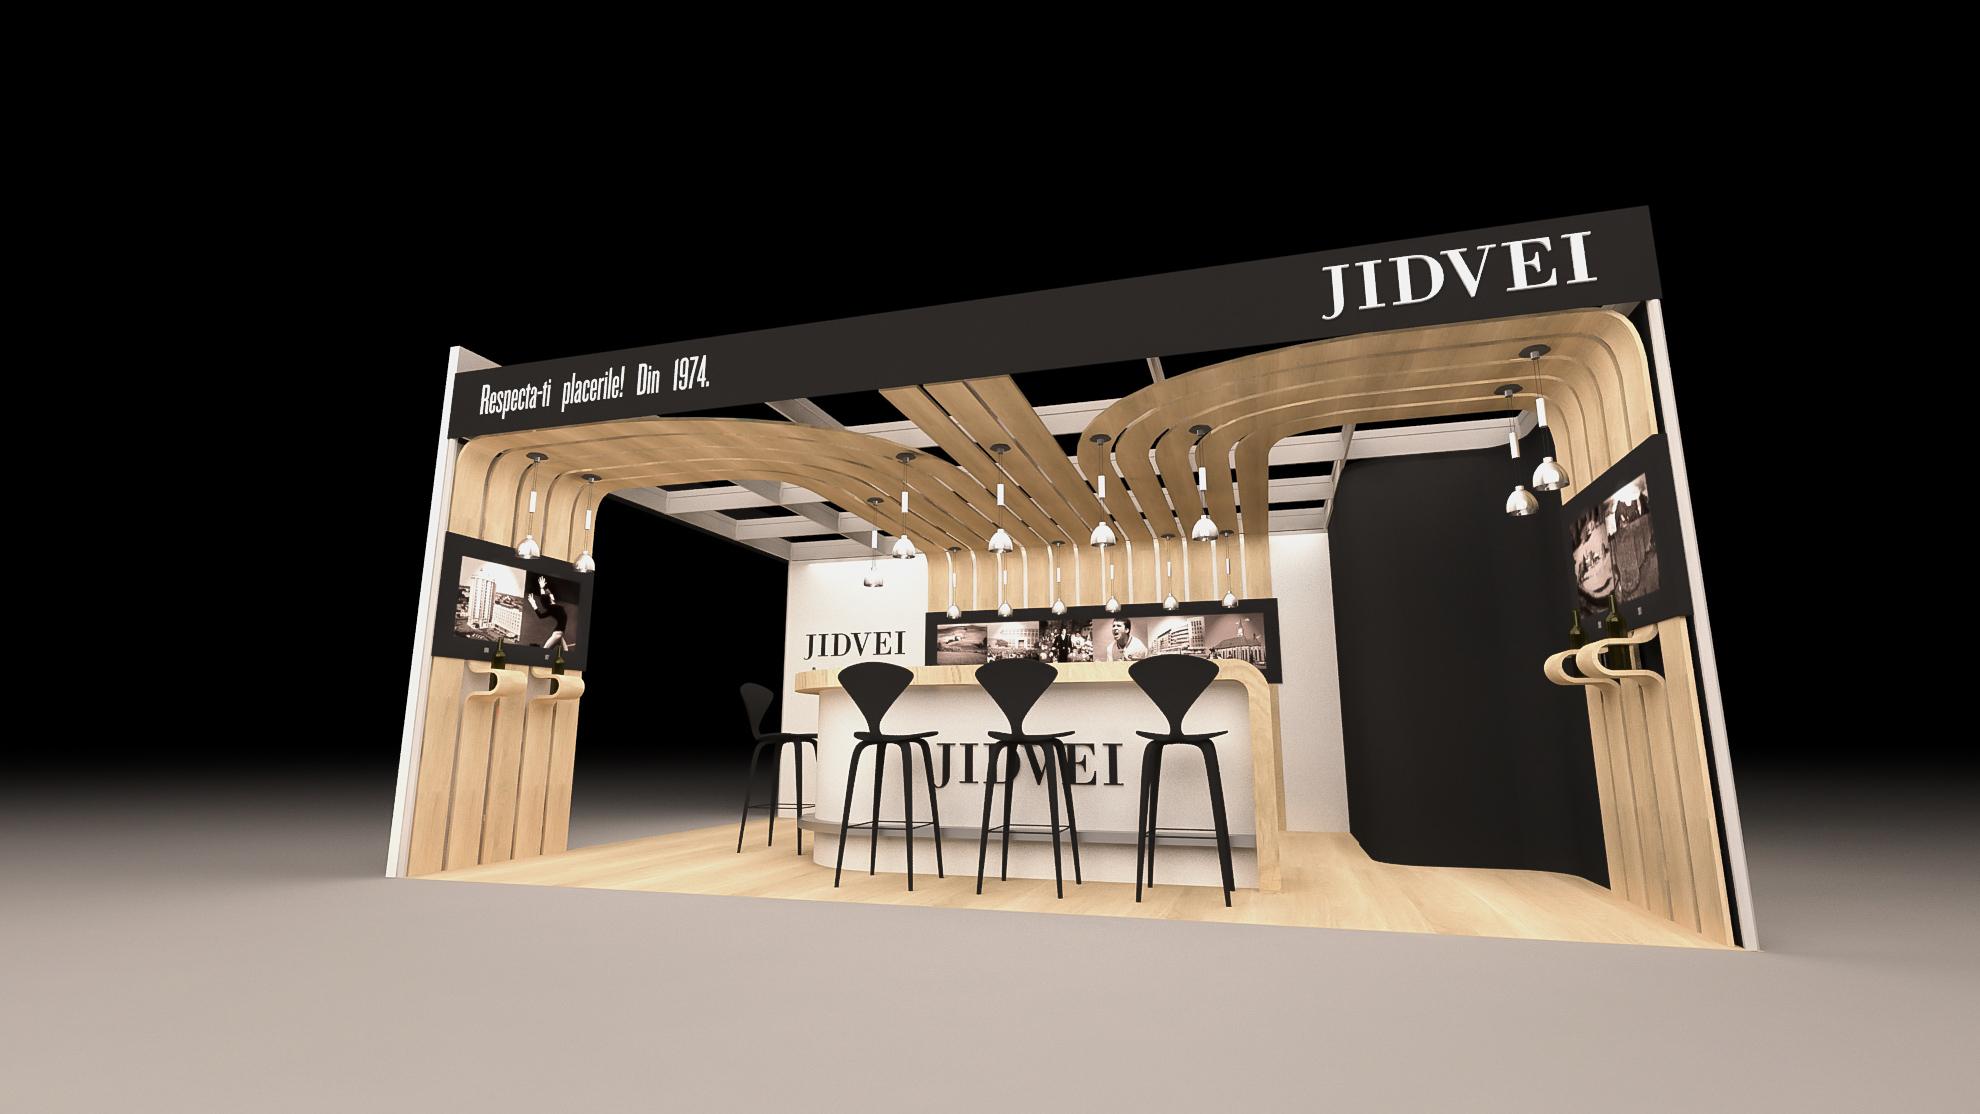 Jidvei Expo Stand